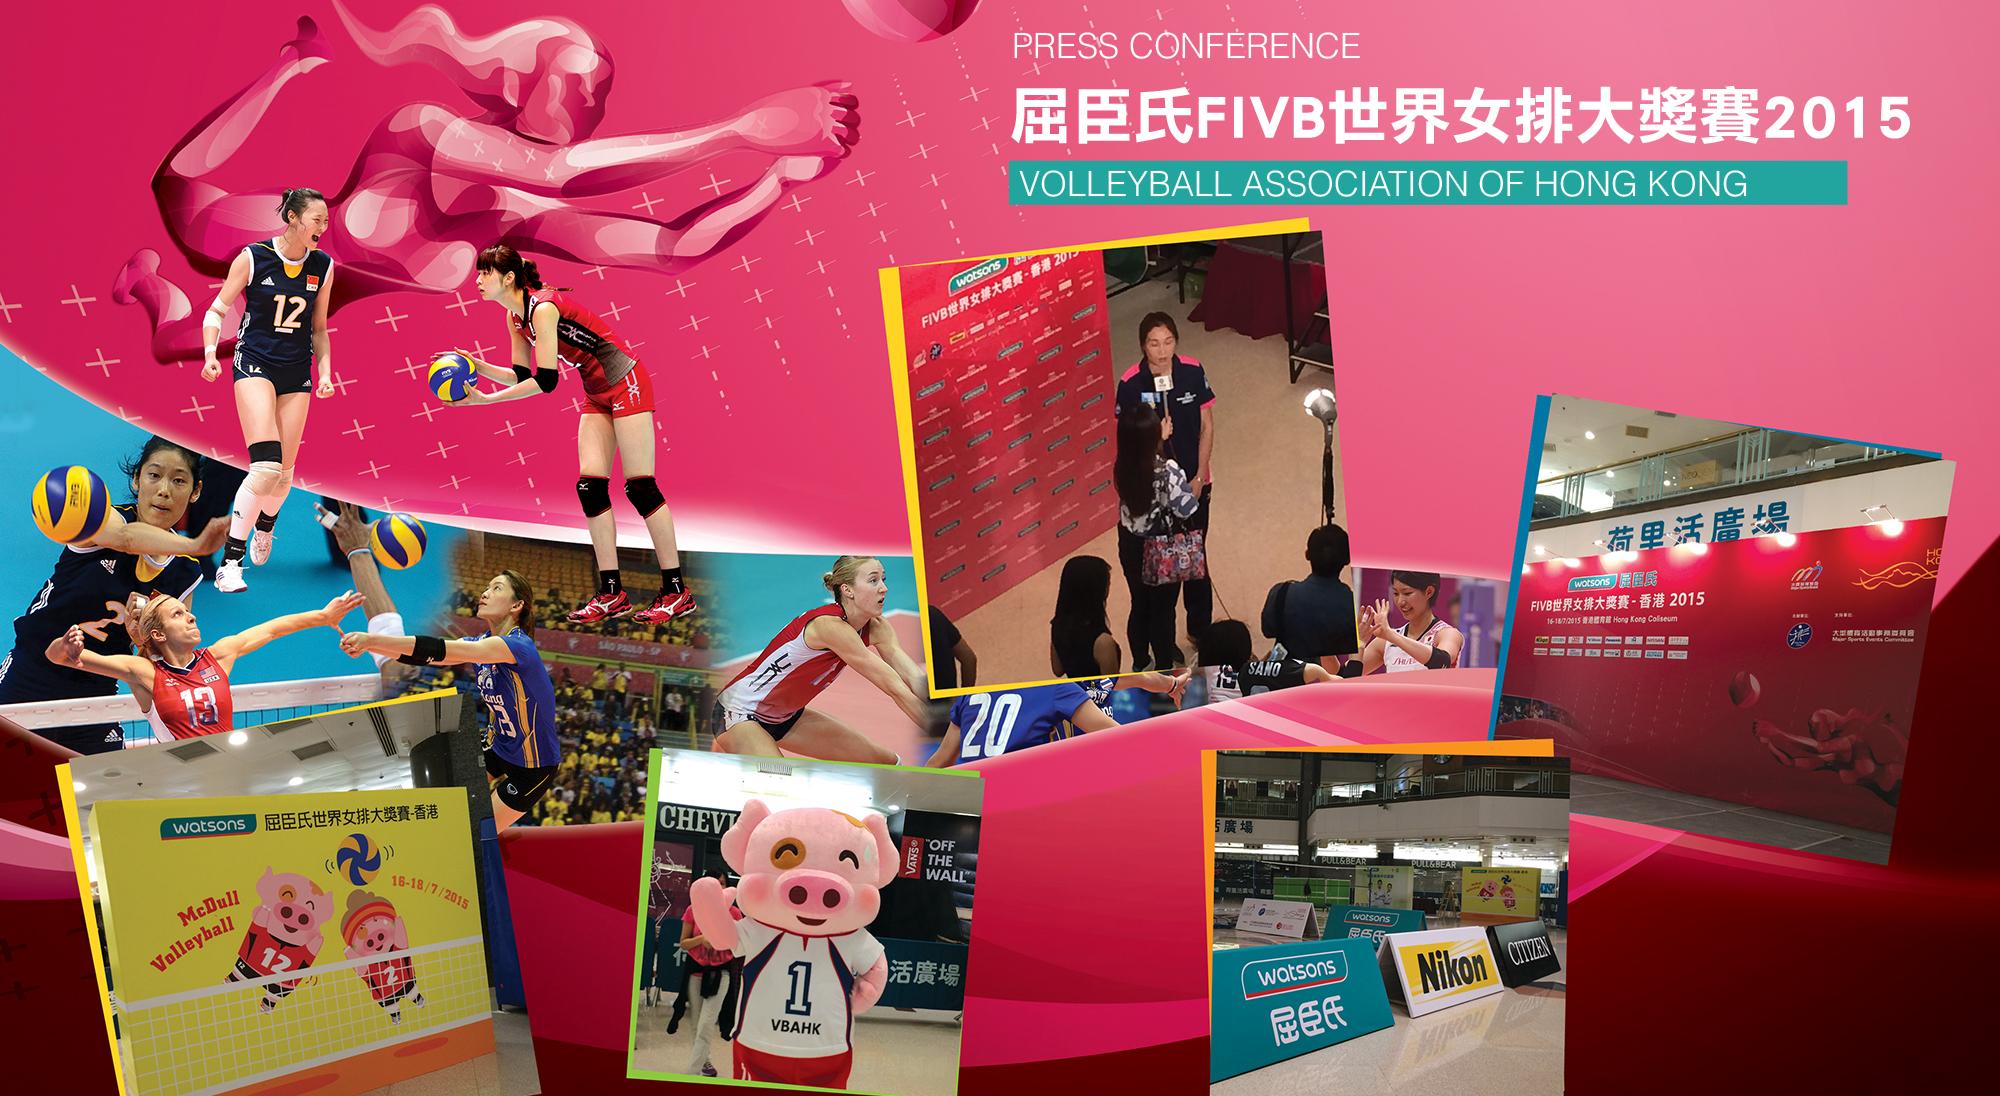 Volleyball Association of Hong Kong - PRESS CONFERENCE